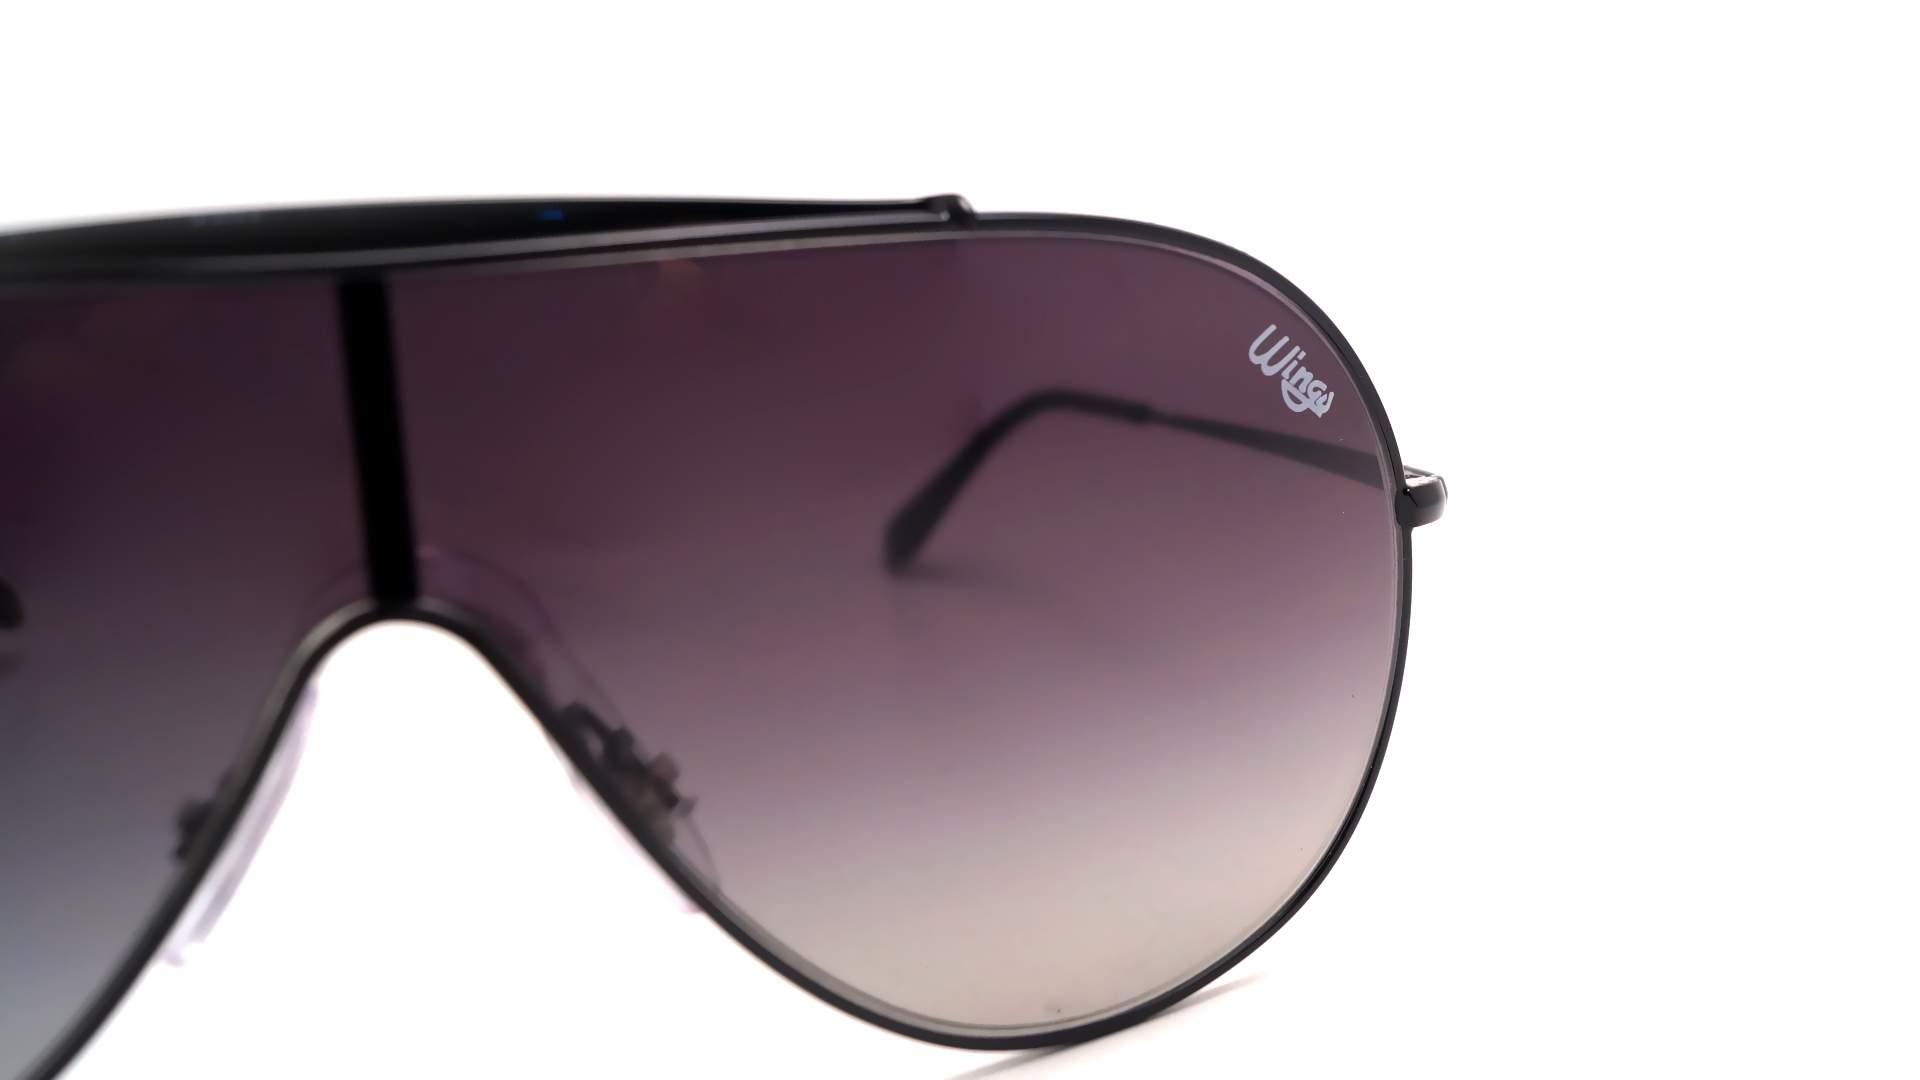 156a7fe8197 Sunglasses Ray-Ban Wings Black RB3597 002 11 33-18 Medium Gradient